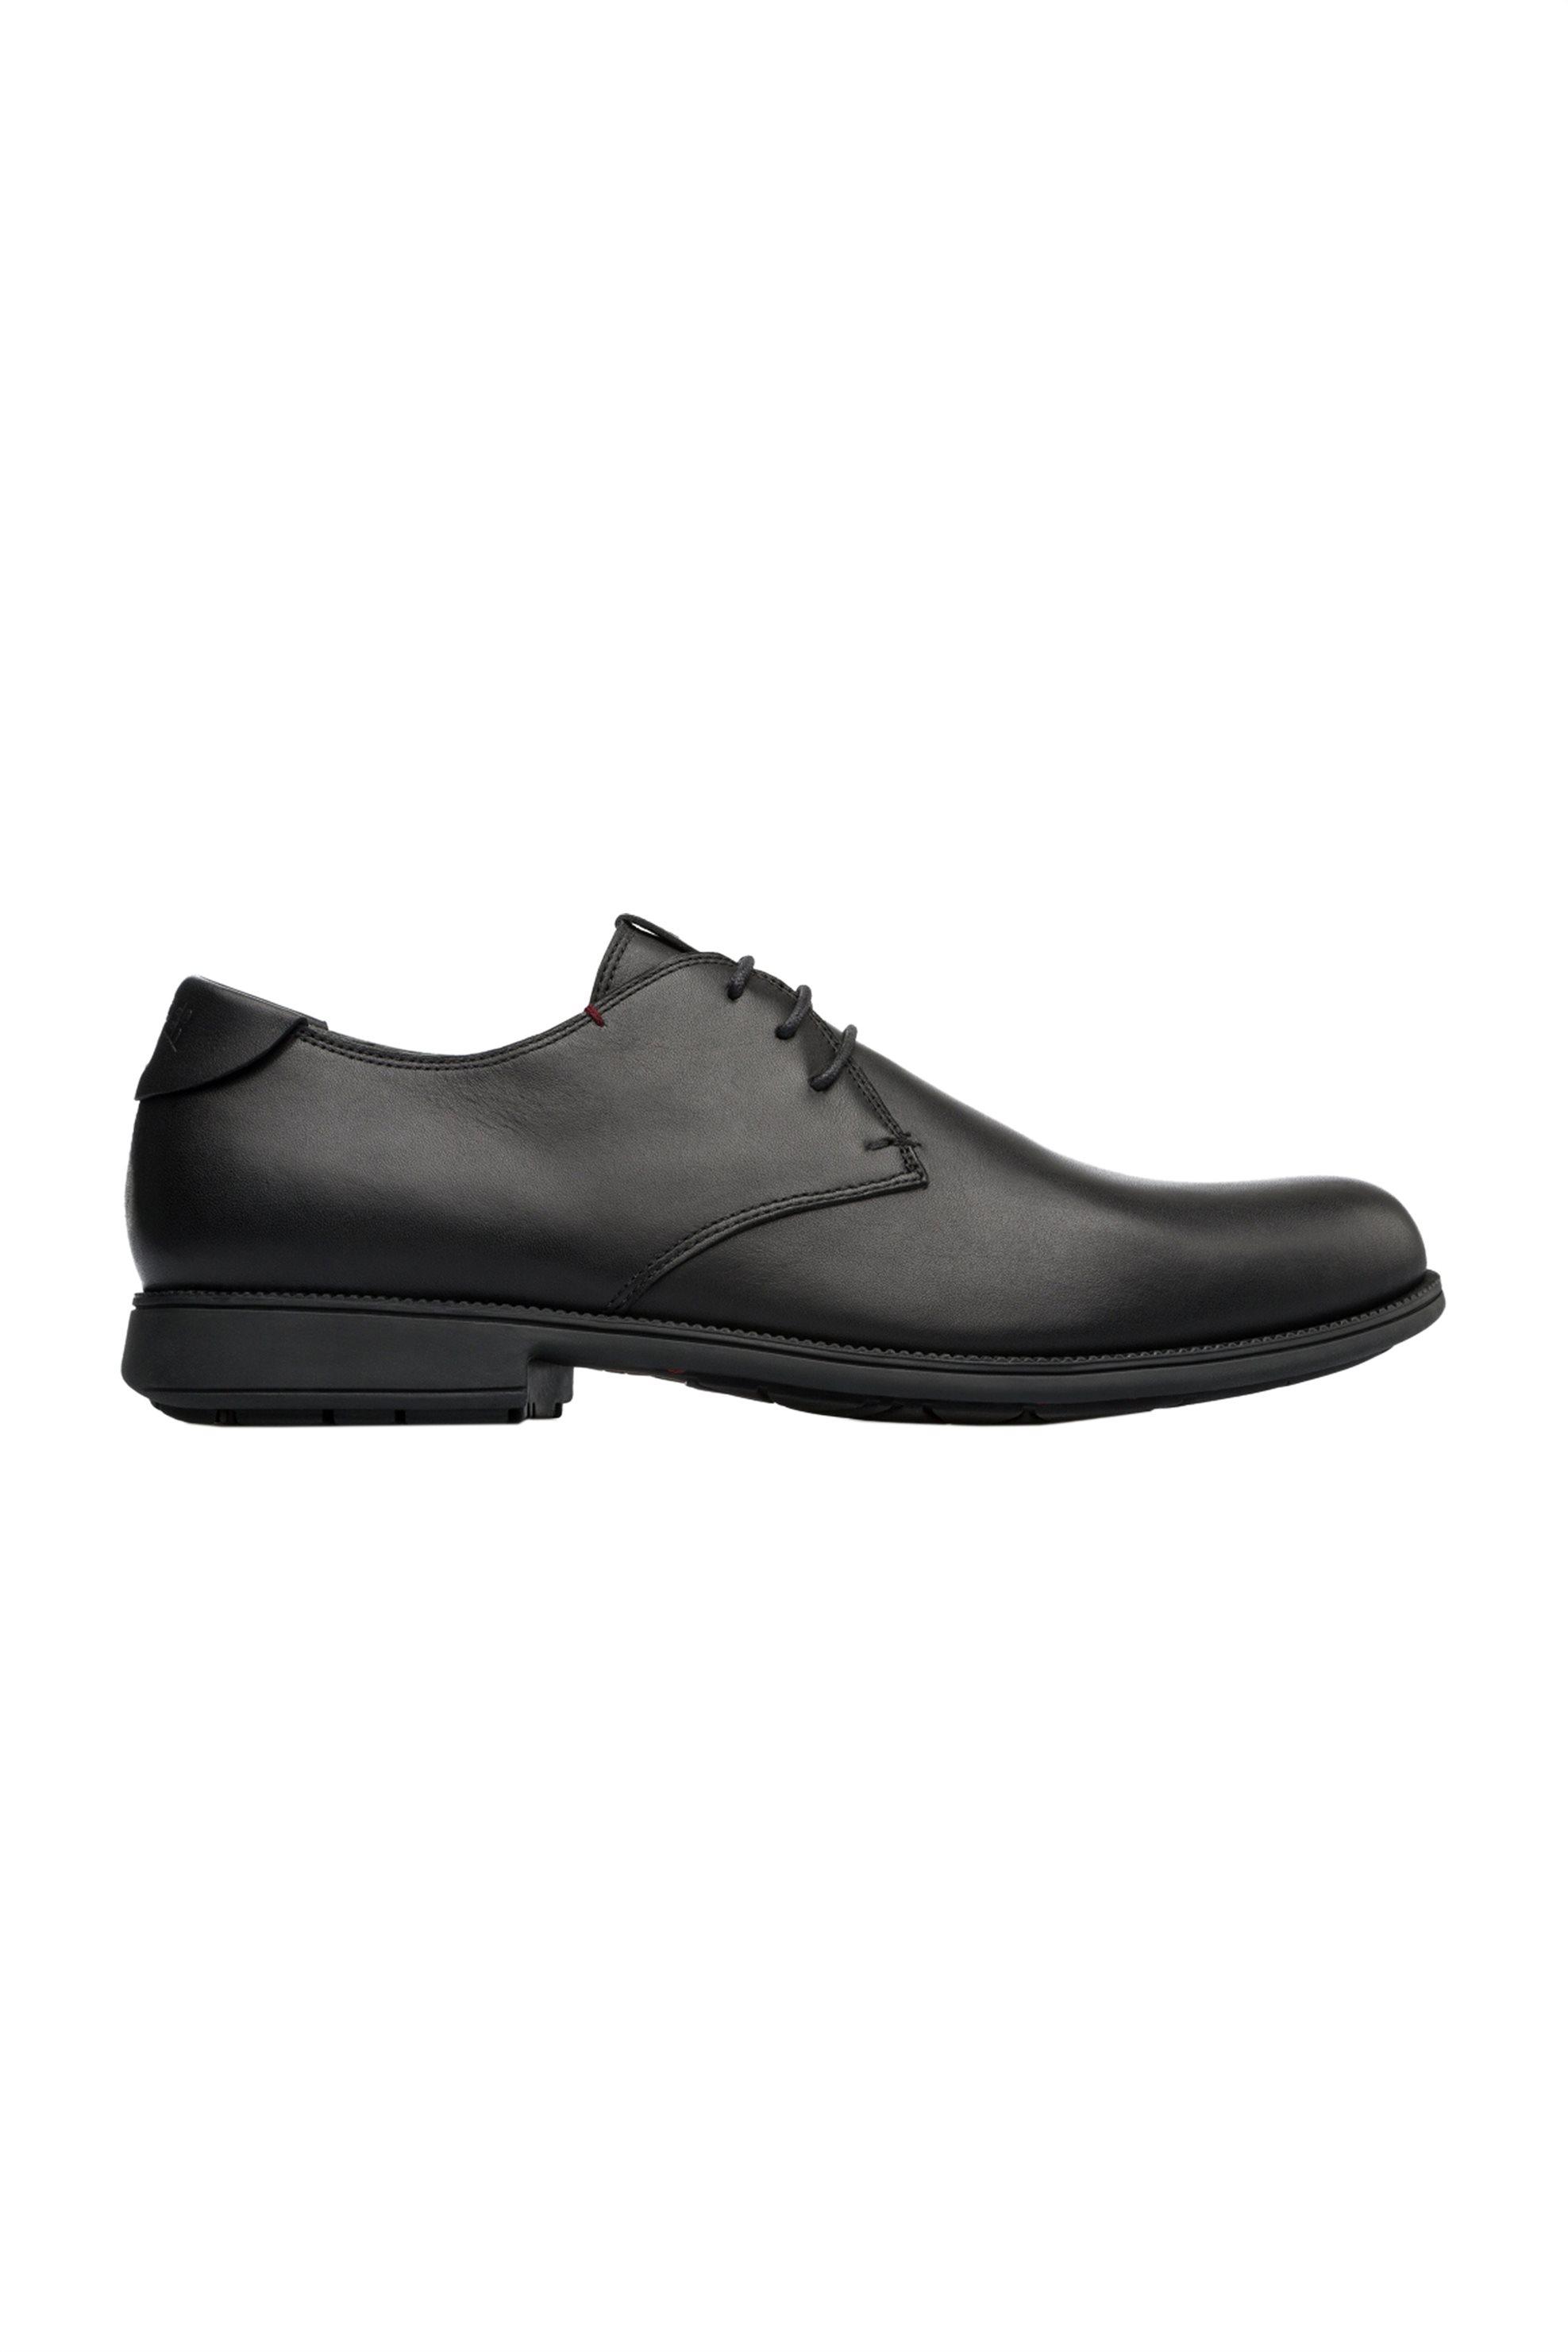 Camper ανδρικά δερμάτινα παπούτσια Mil – 18552-074 – Μαύρο